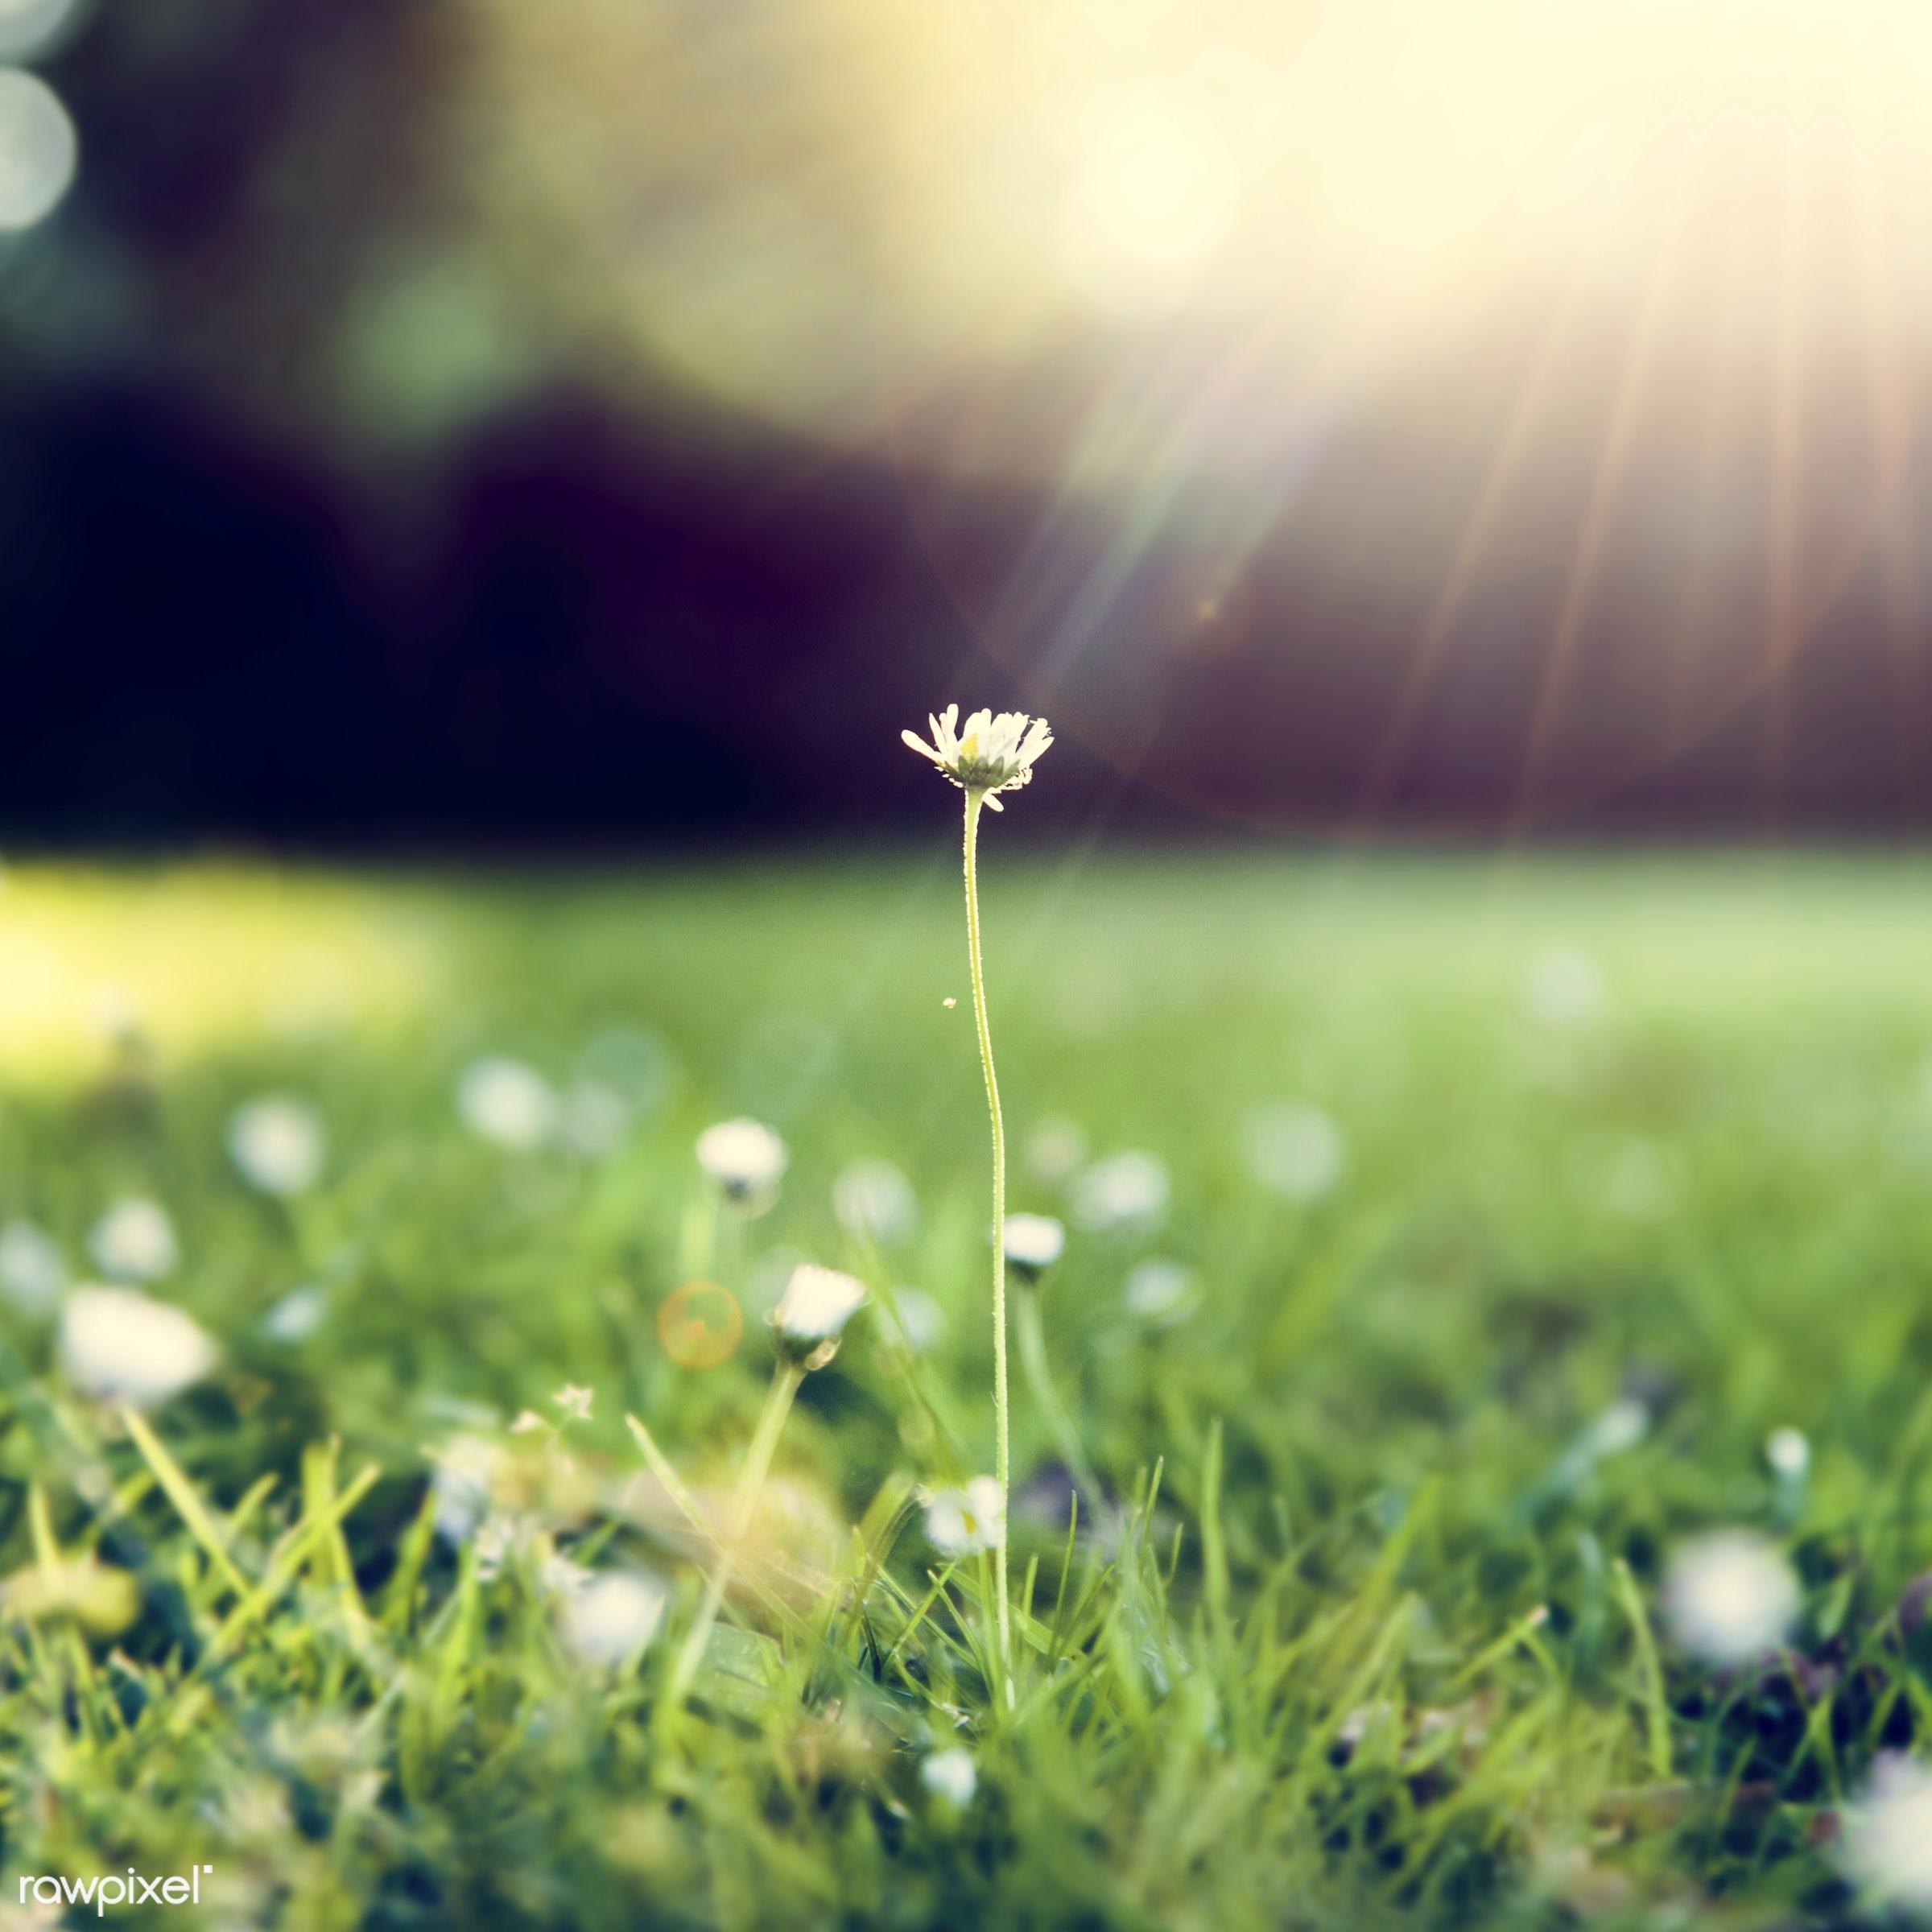 attractive, beautiful, carefree, environment, flower, focus, fresh, freshness, fun, garden, grass, grassland, green, leisure...